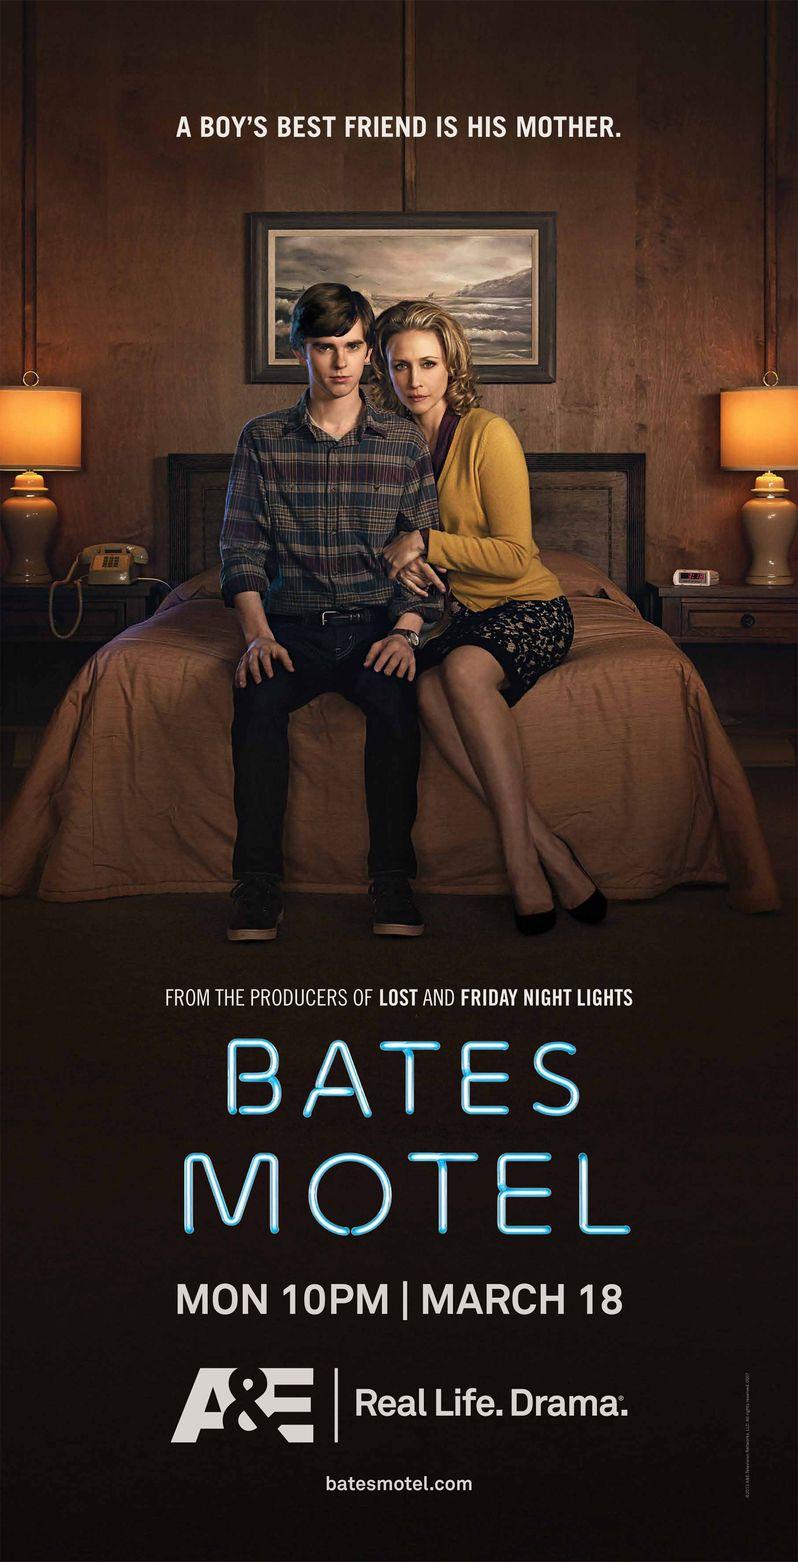 <strong><em>Bates Motel</em></strong> Season 1 Promo Art